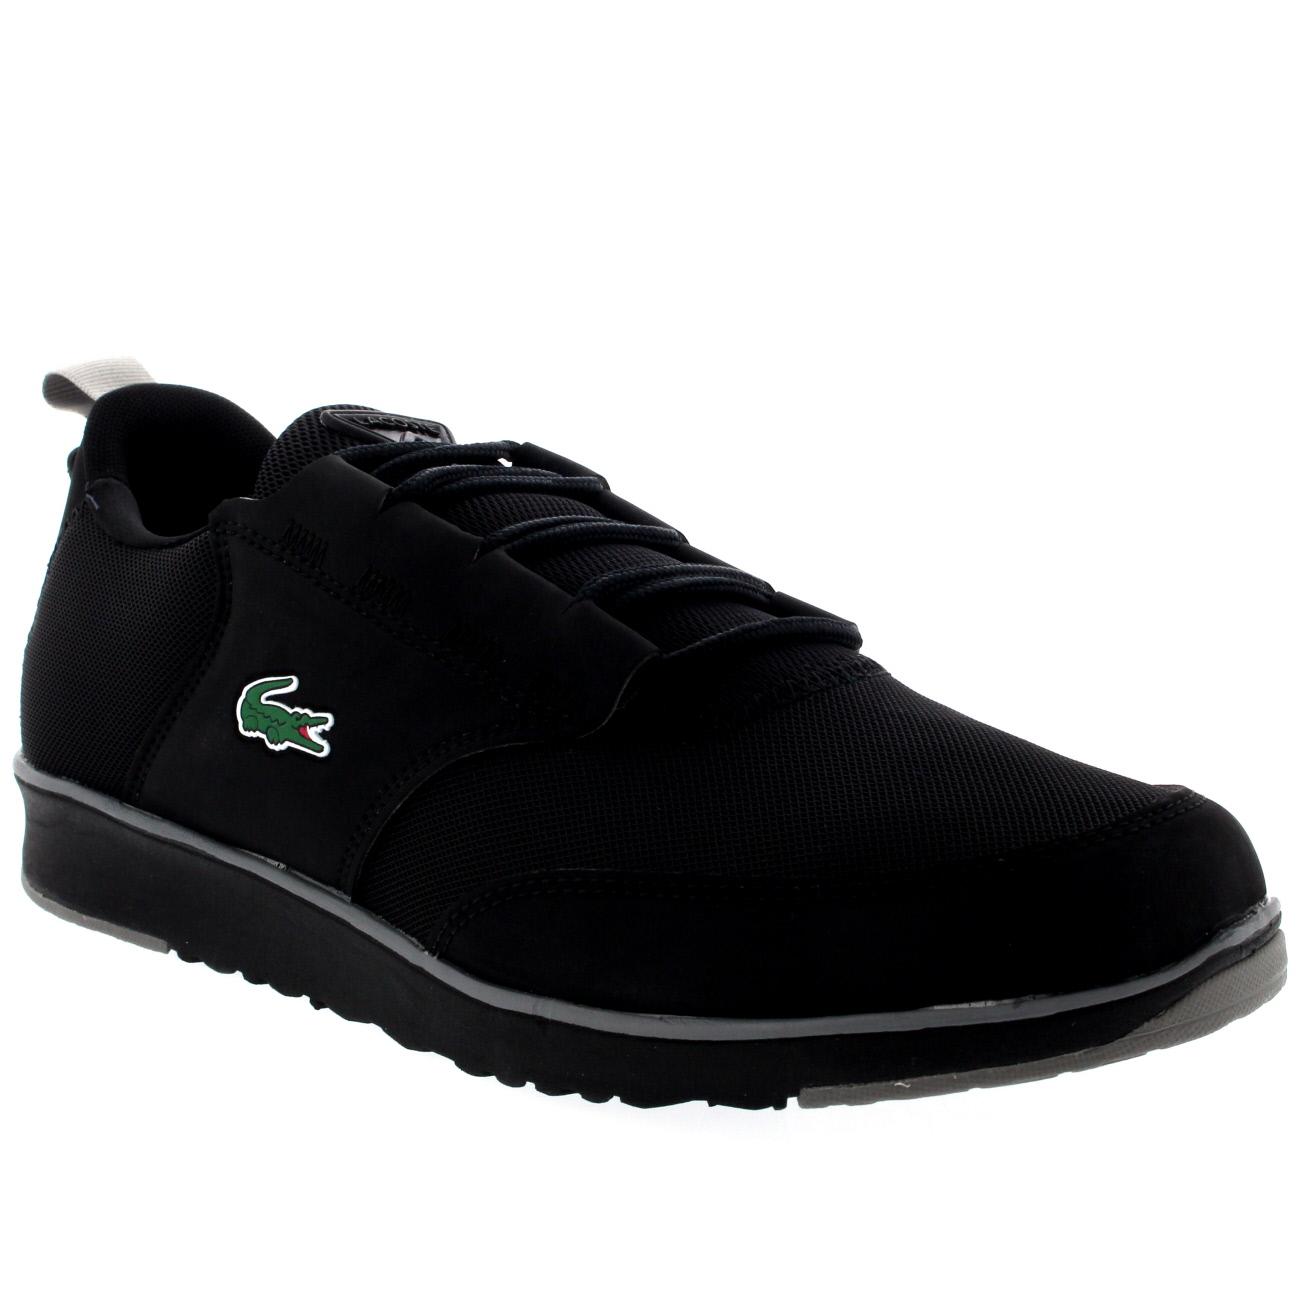 Sneakers Light Blackblack Lacoste Sneakers Blackblack Lacoste Light 0wPkO8nX